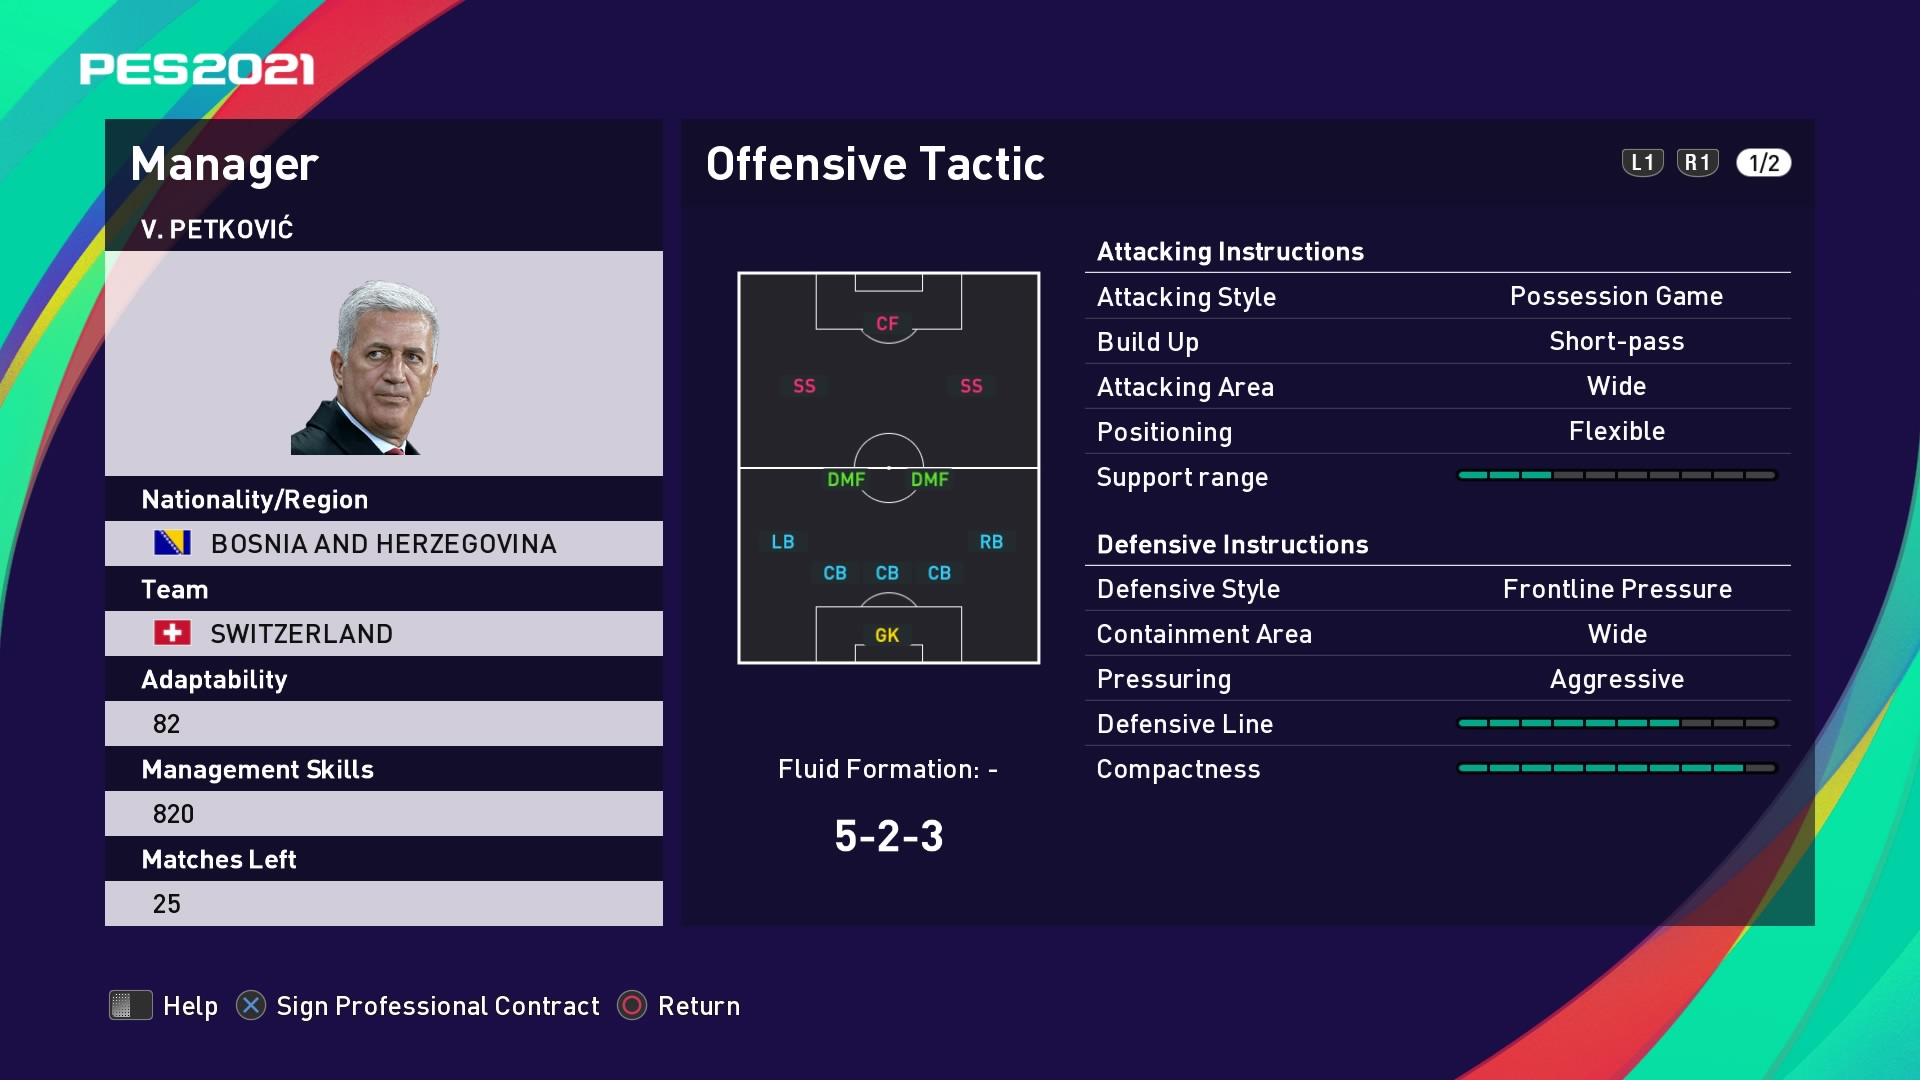 V. Petković (Vladimir Petković) Offensive Tactic in PES 2021 myClub